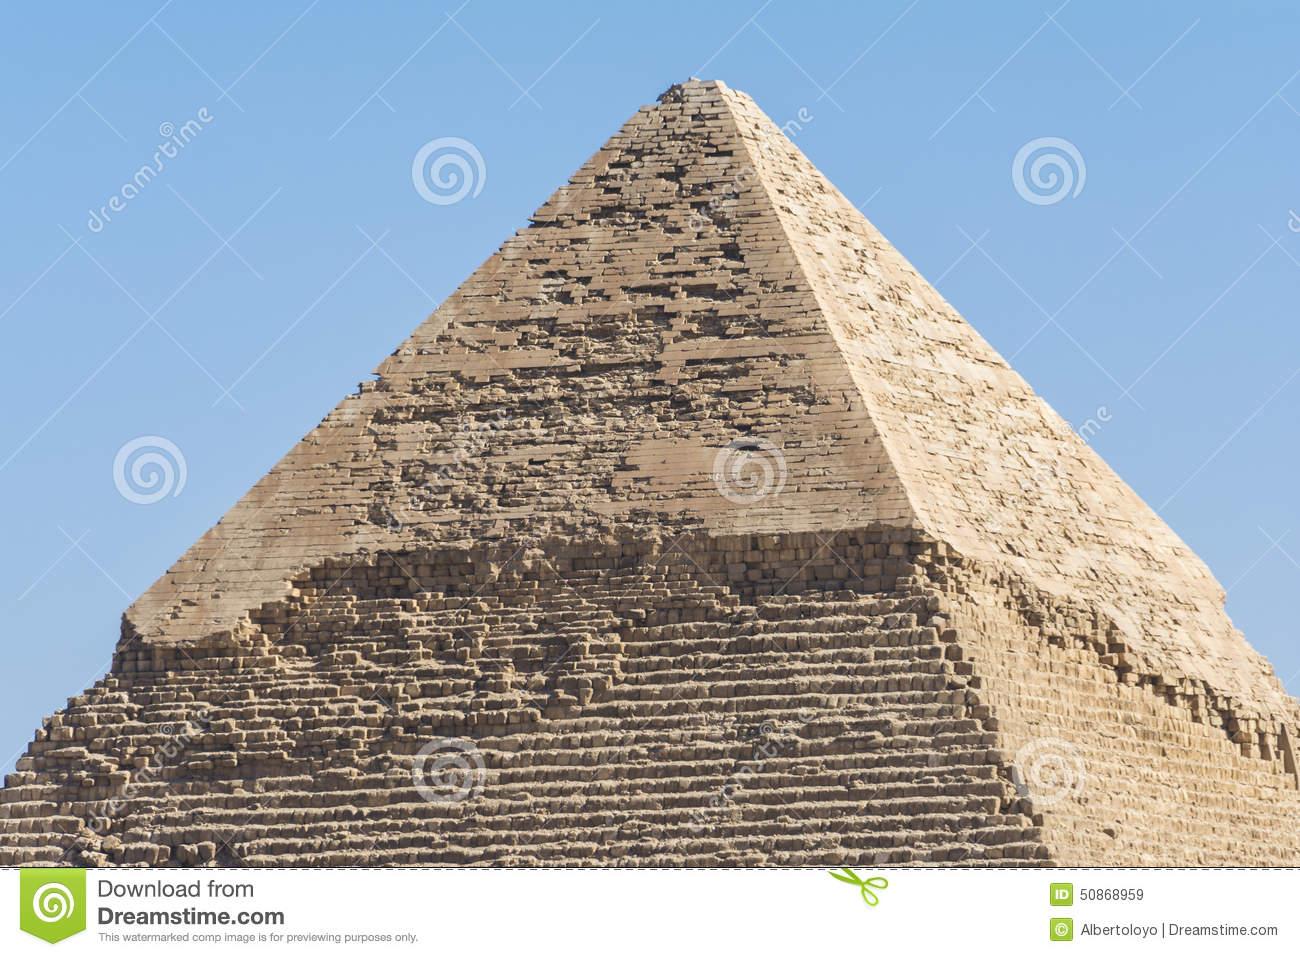 Pyramid Of Khafre, Giza, Egypt Stock Photo.